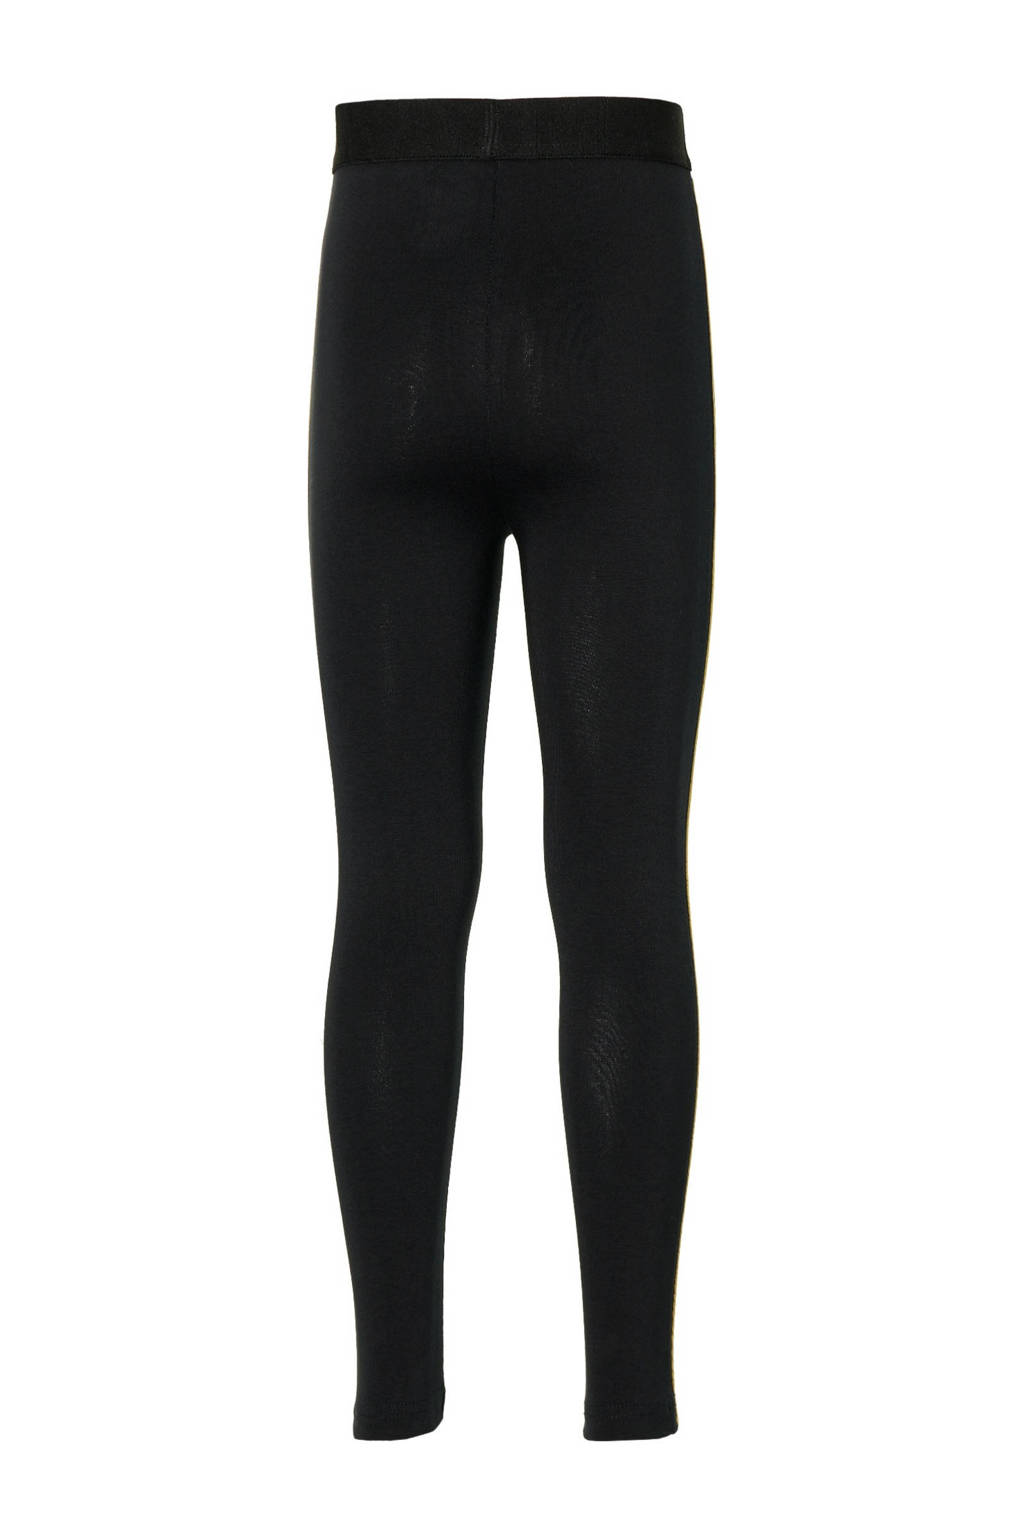 Quapi Girls regular fit legging Domiq zwart, Zwart